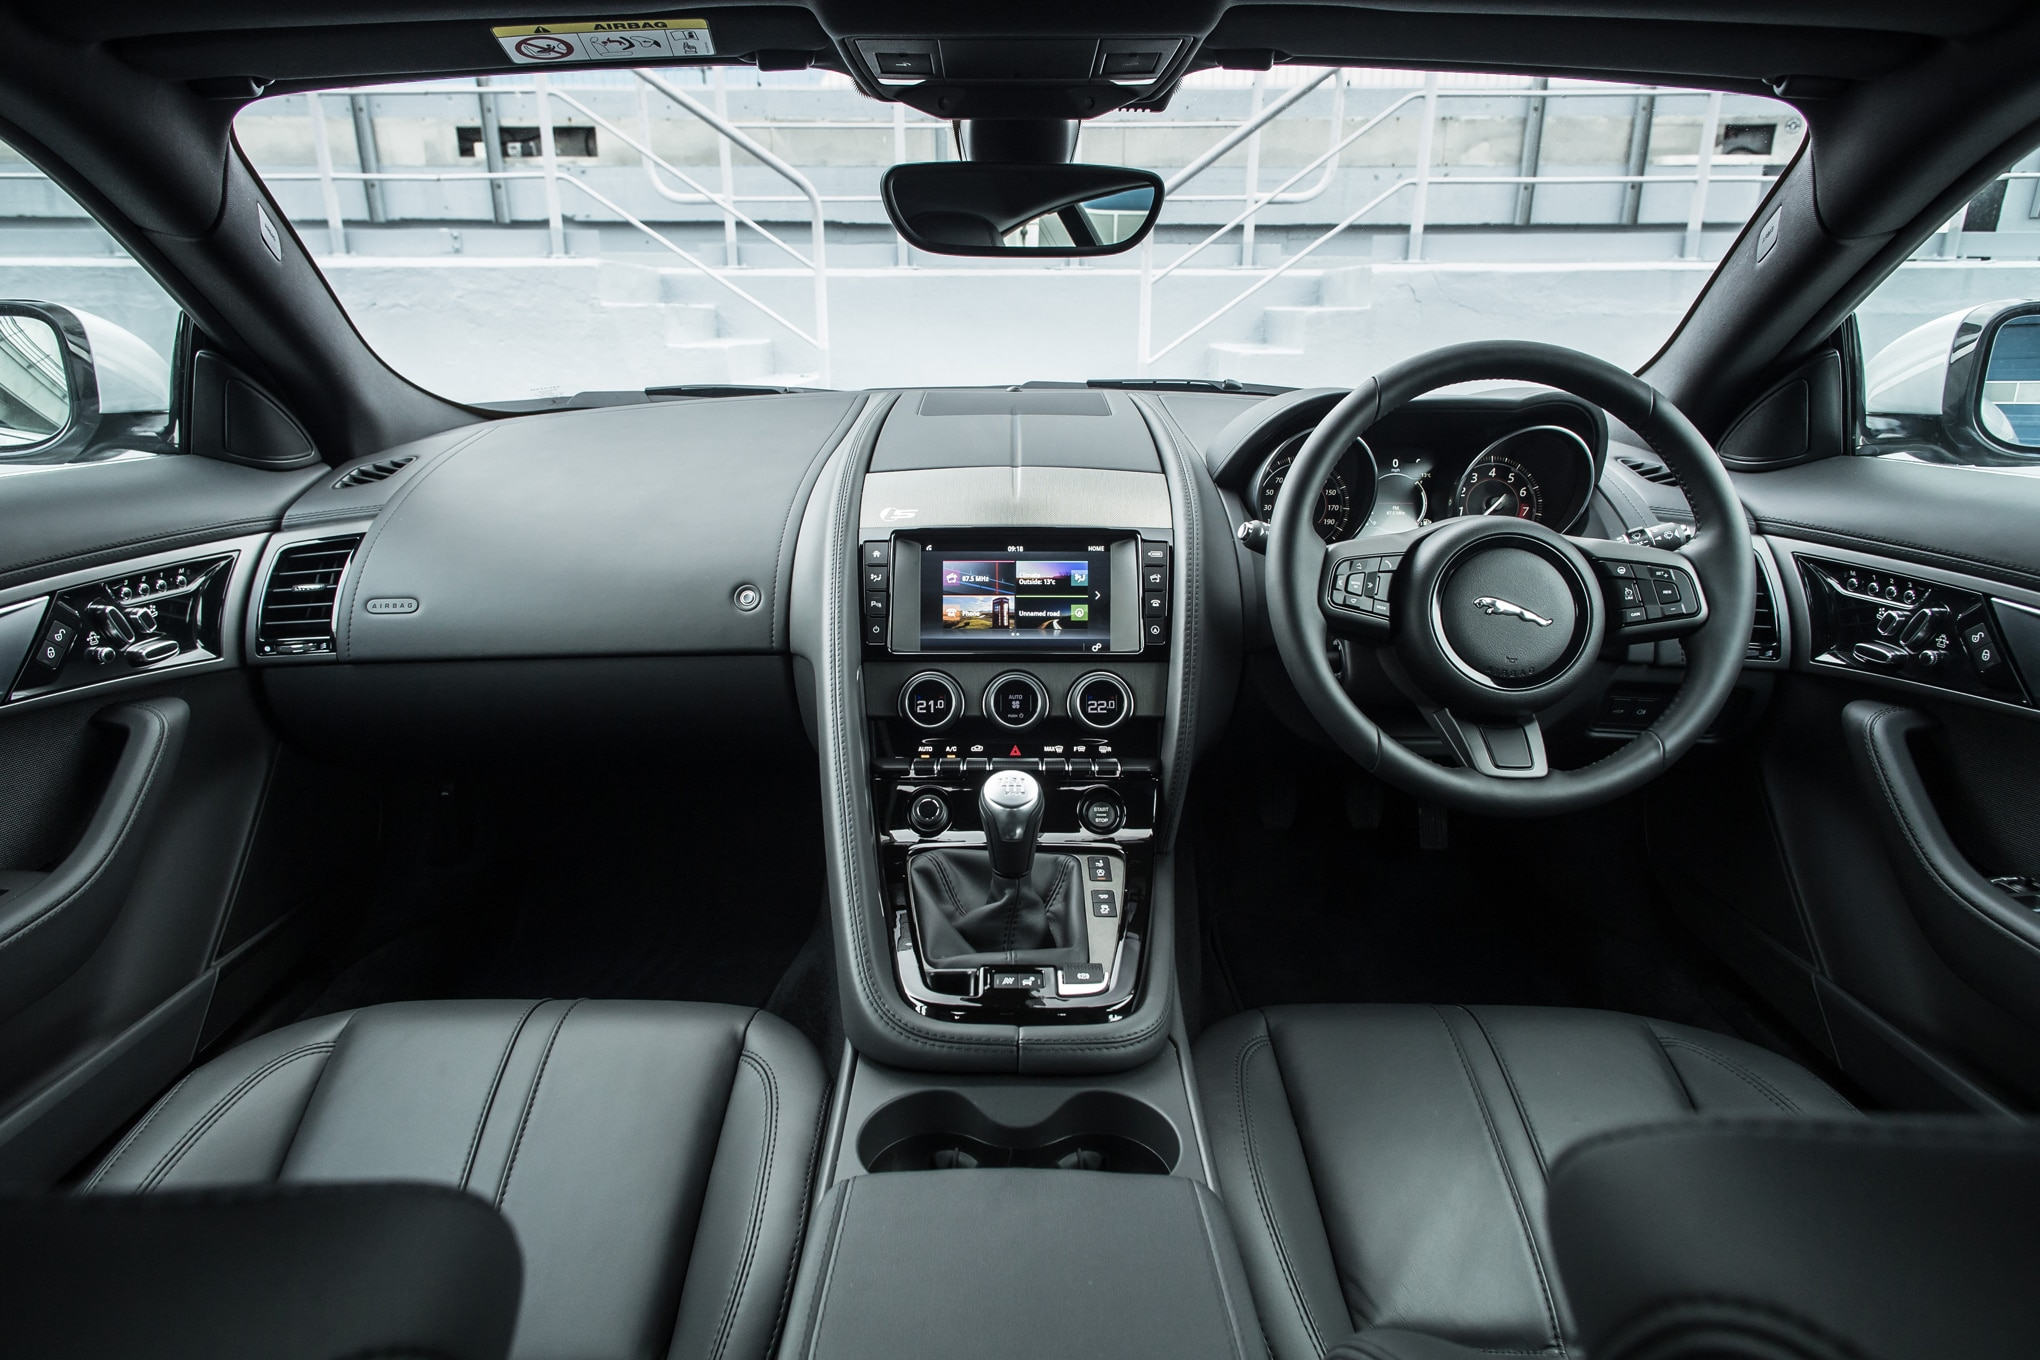 2016 jaguar f type with 6 speed manual review rh automobilemag com jaguar manual transmission cars jaguar manual transmission 2018